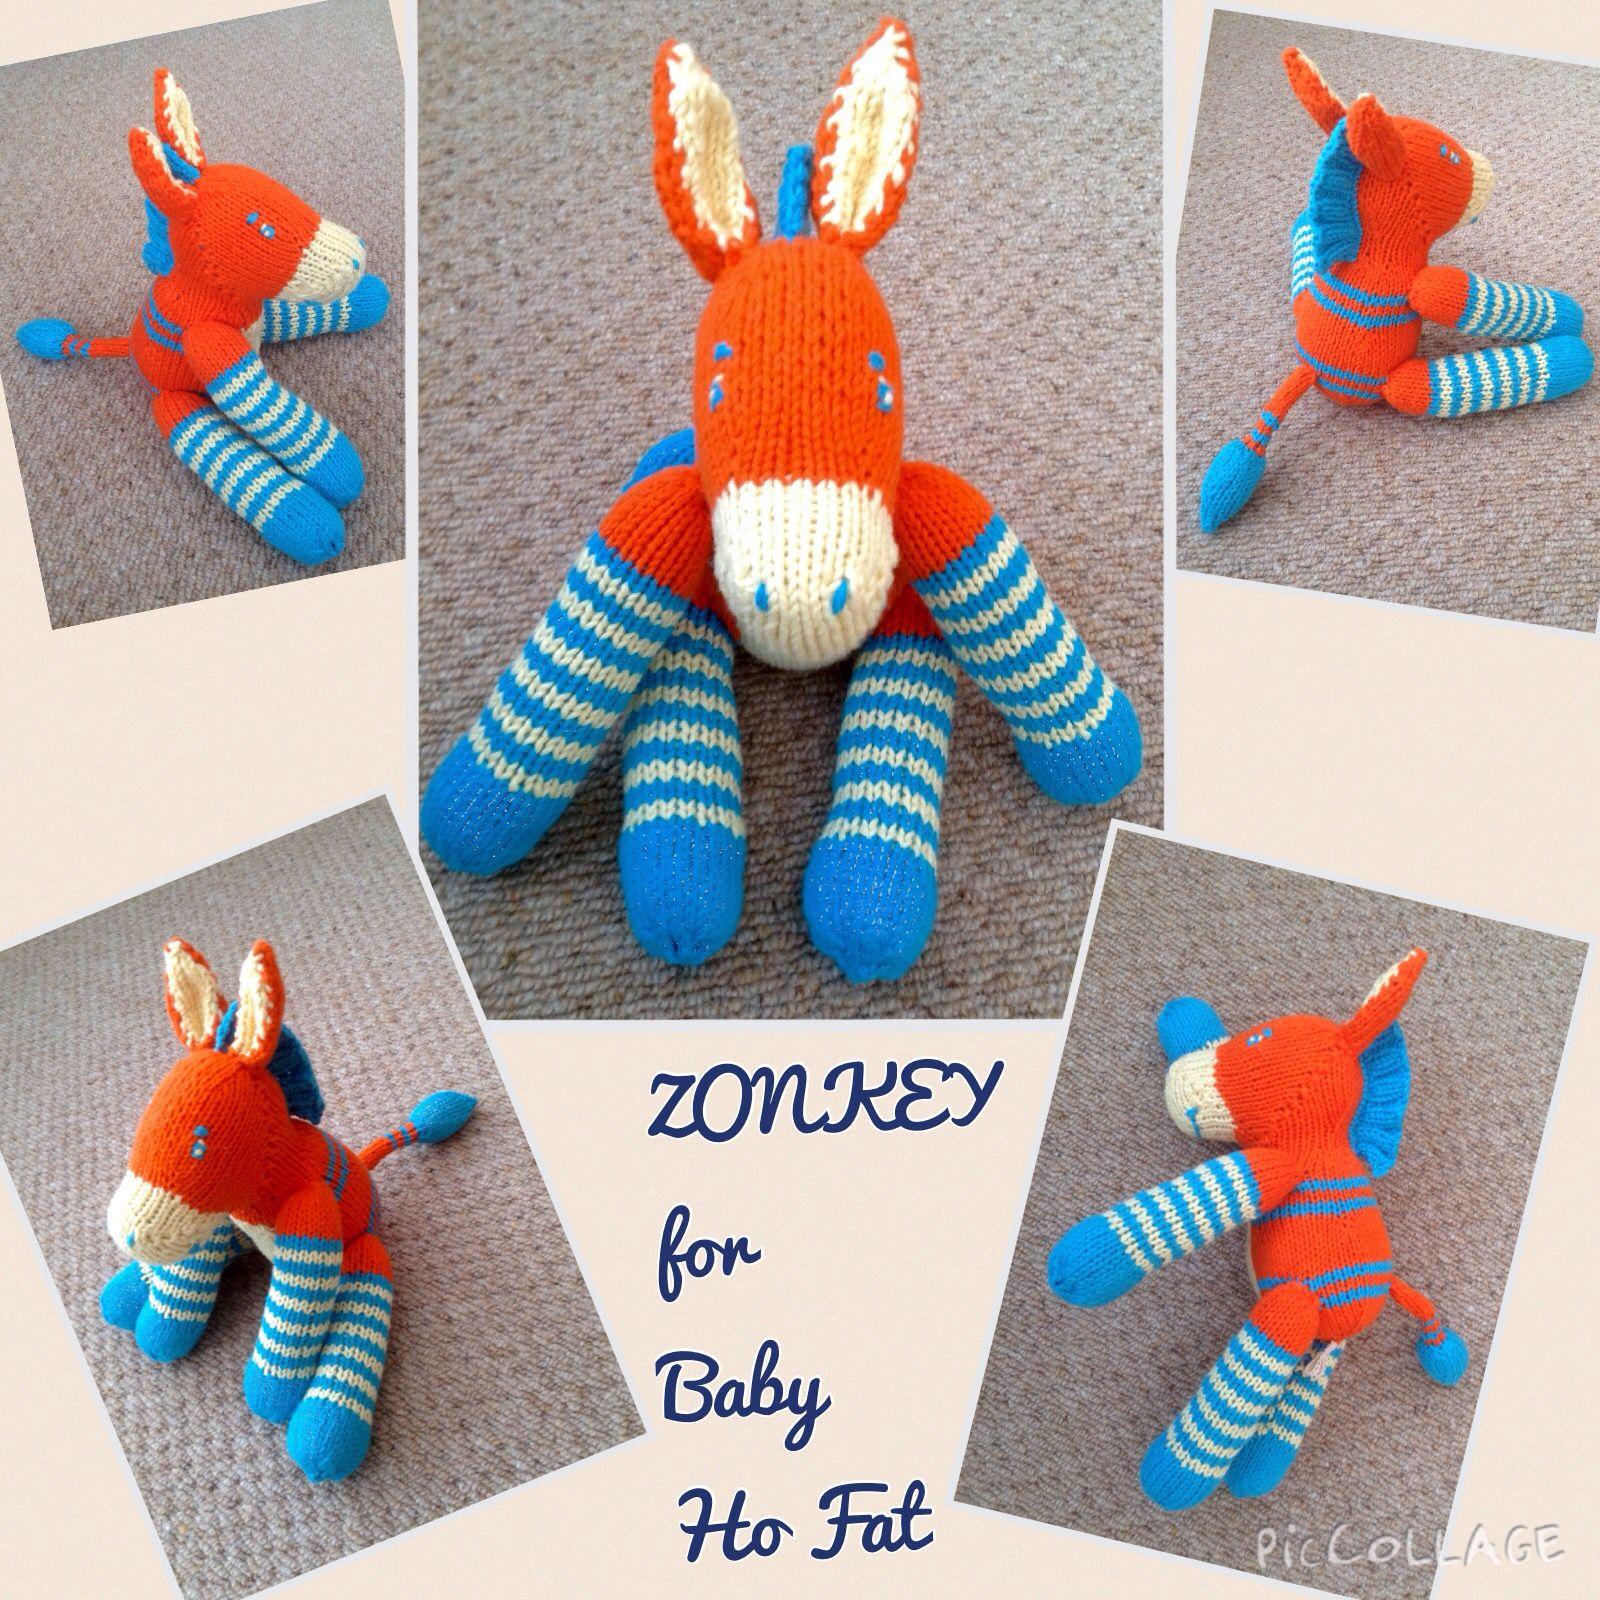 Just finished knitting this Zonkey. Pattern by Cara Key ...